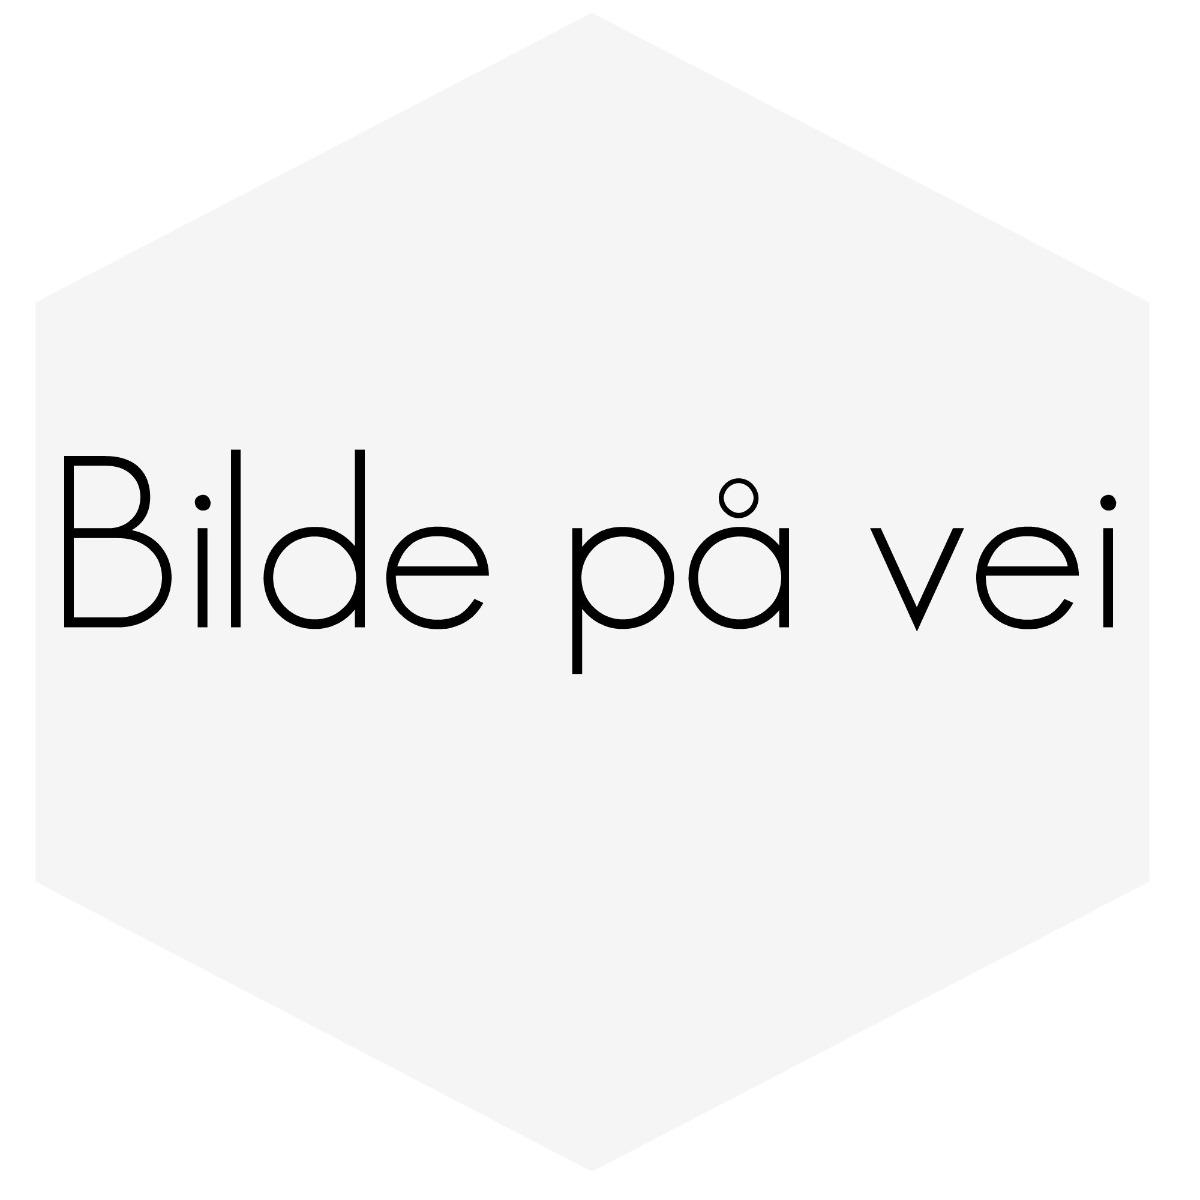 VANNPUMPE TIL VOLVO B200/230 85-98 271975 HØY KVAL.